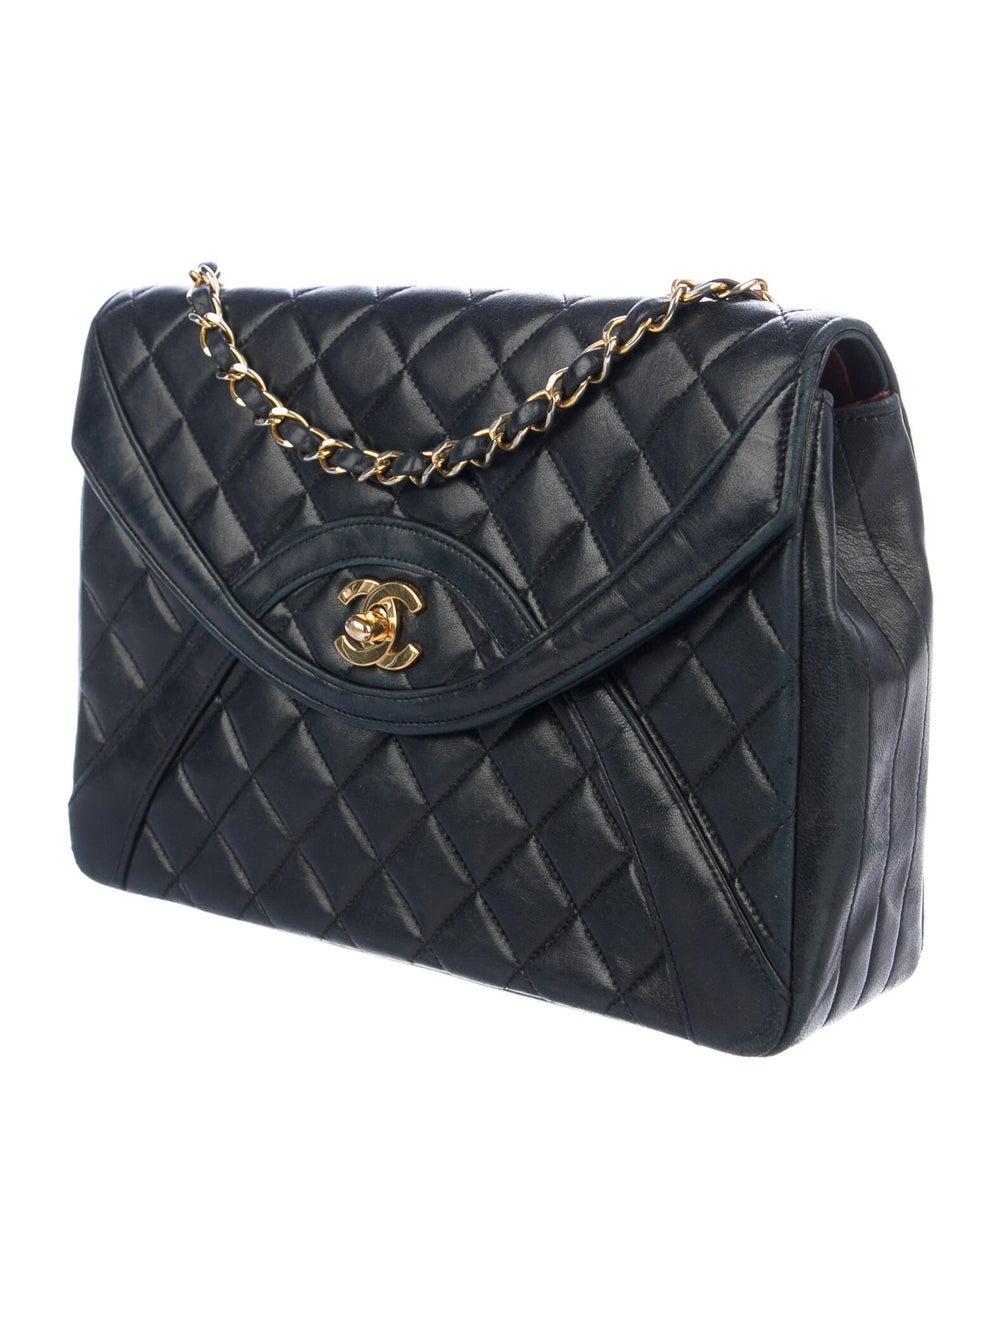 Chanel Vintage Half Moon Flap Bag Blue - image 3